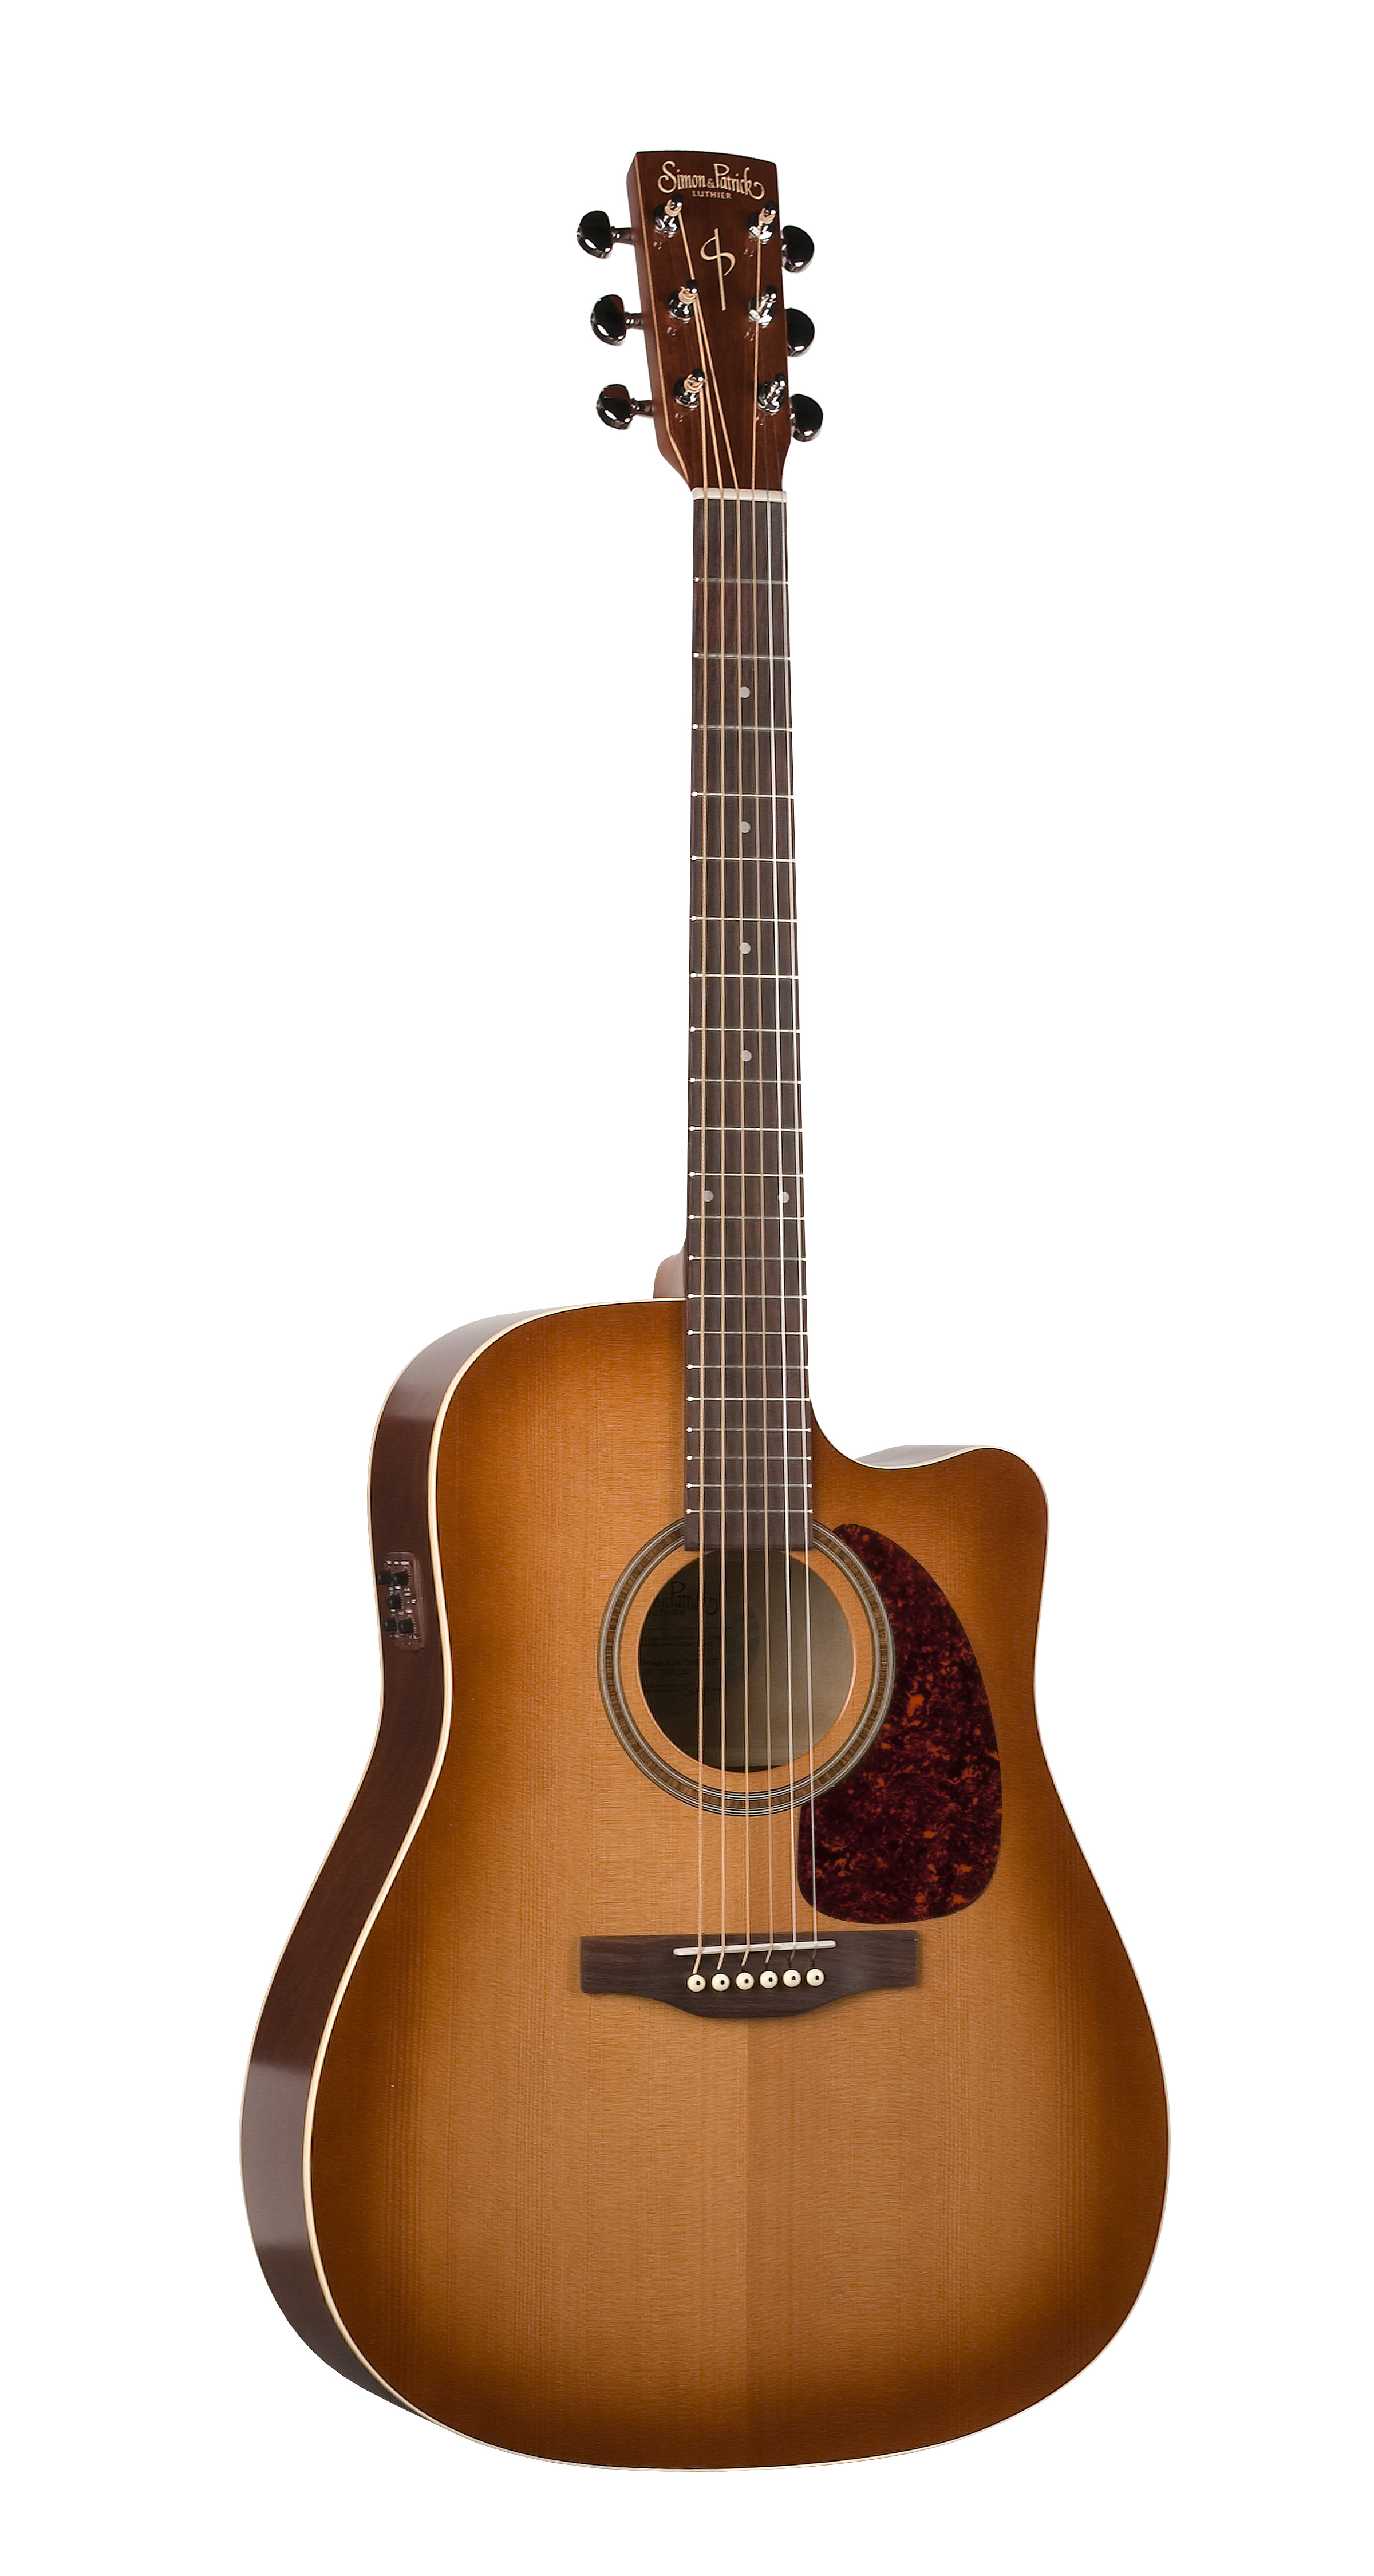 Simon & Patrick 33775 Cedar Vintage Burst Gloss Top (GT) Cutaway Dreadnought Acoustic Electric Guitar w/ B-band A3T